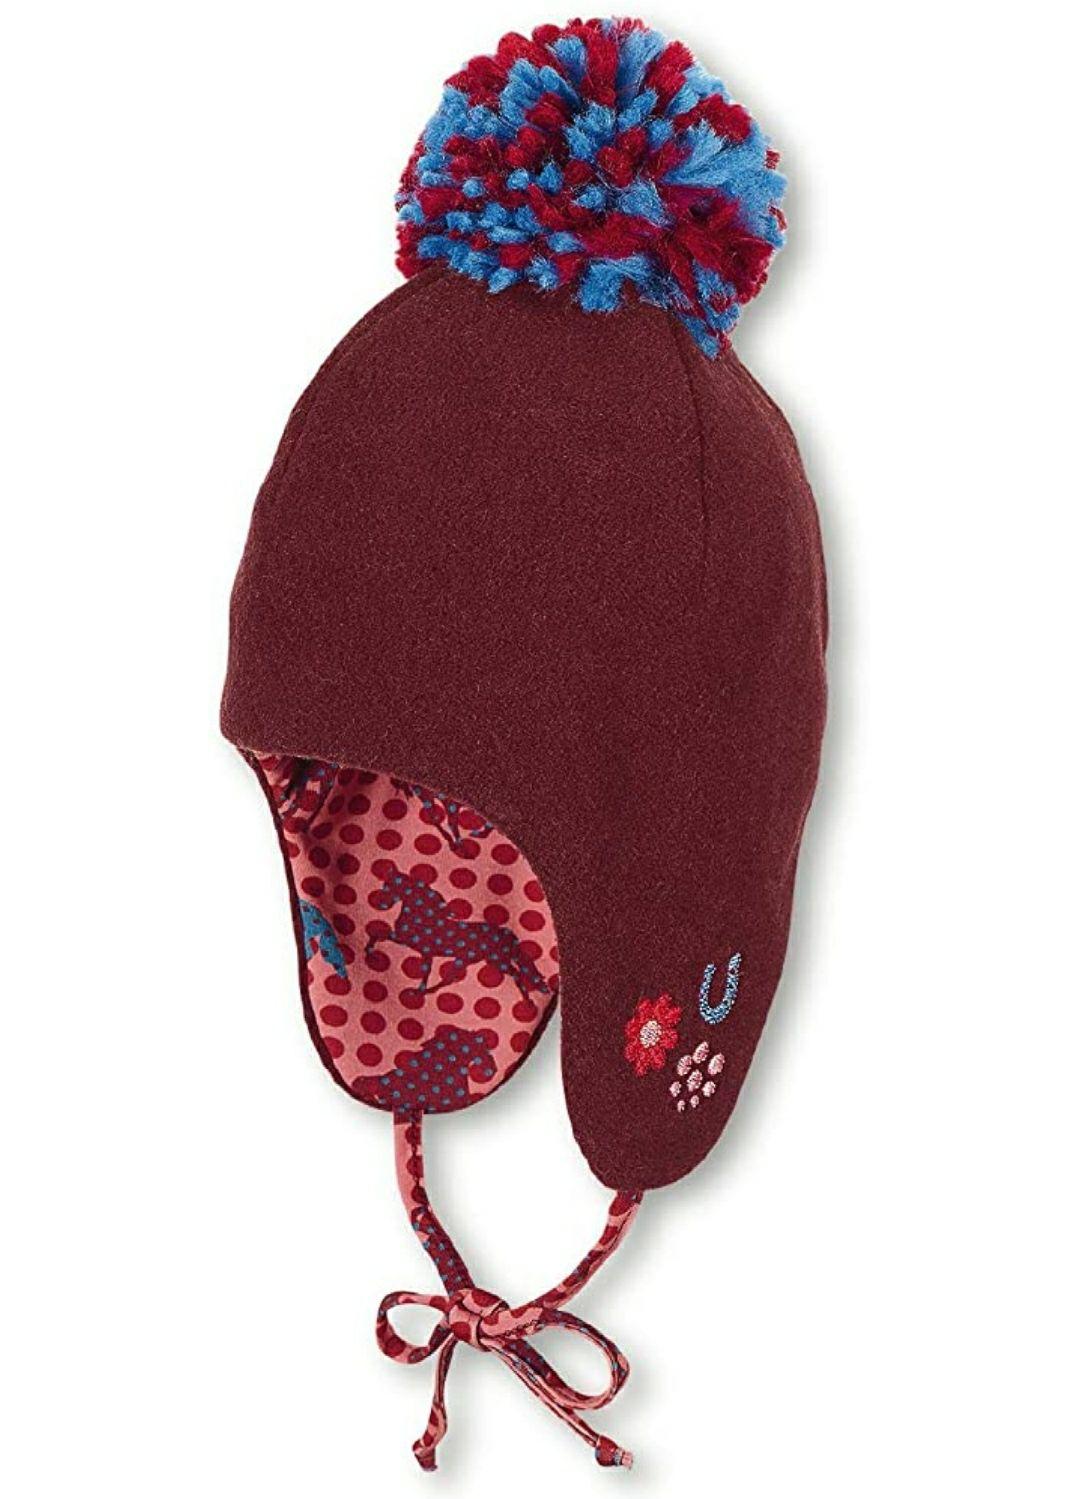 TALLA 45cm - Sterntaler Inka-mütze Cappellopello Gorro de Punto para Bebés